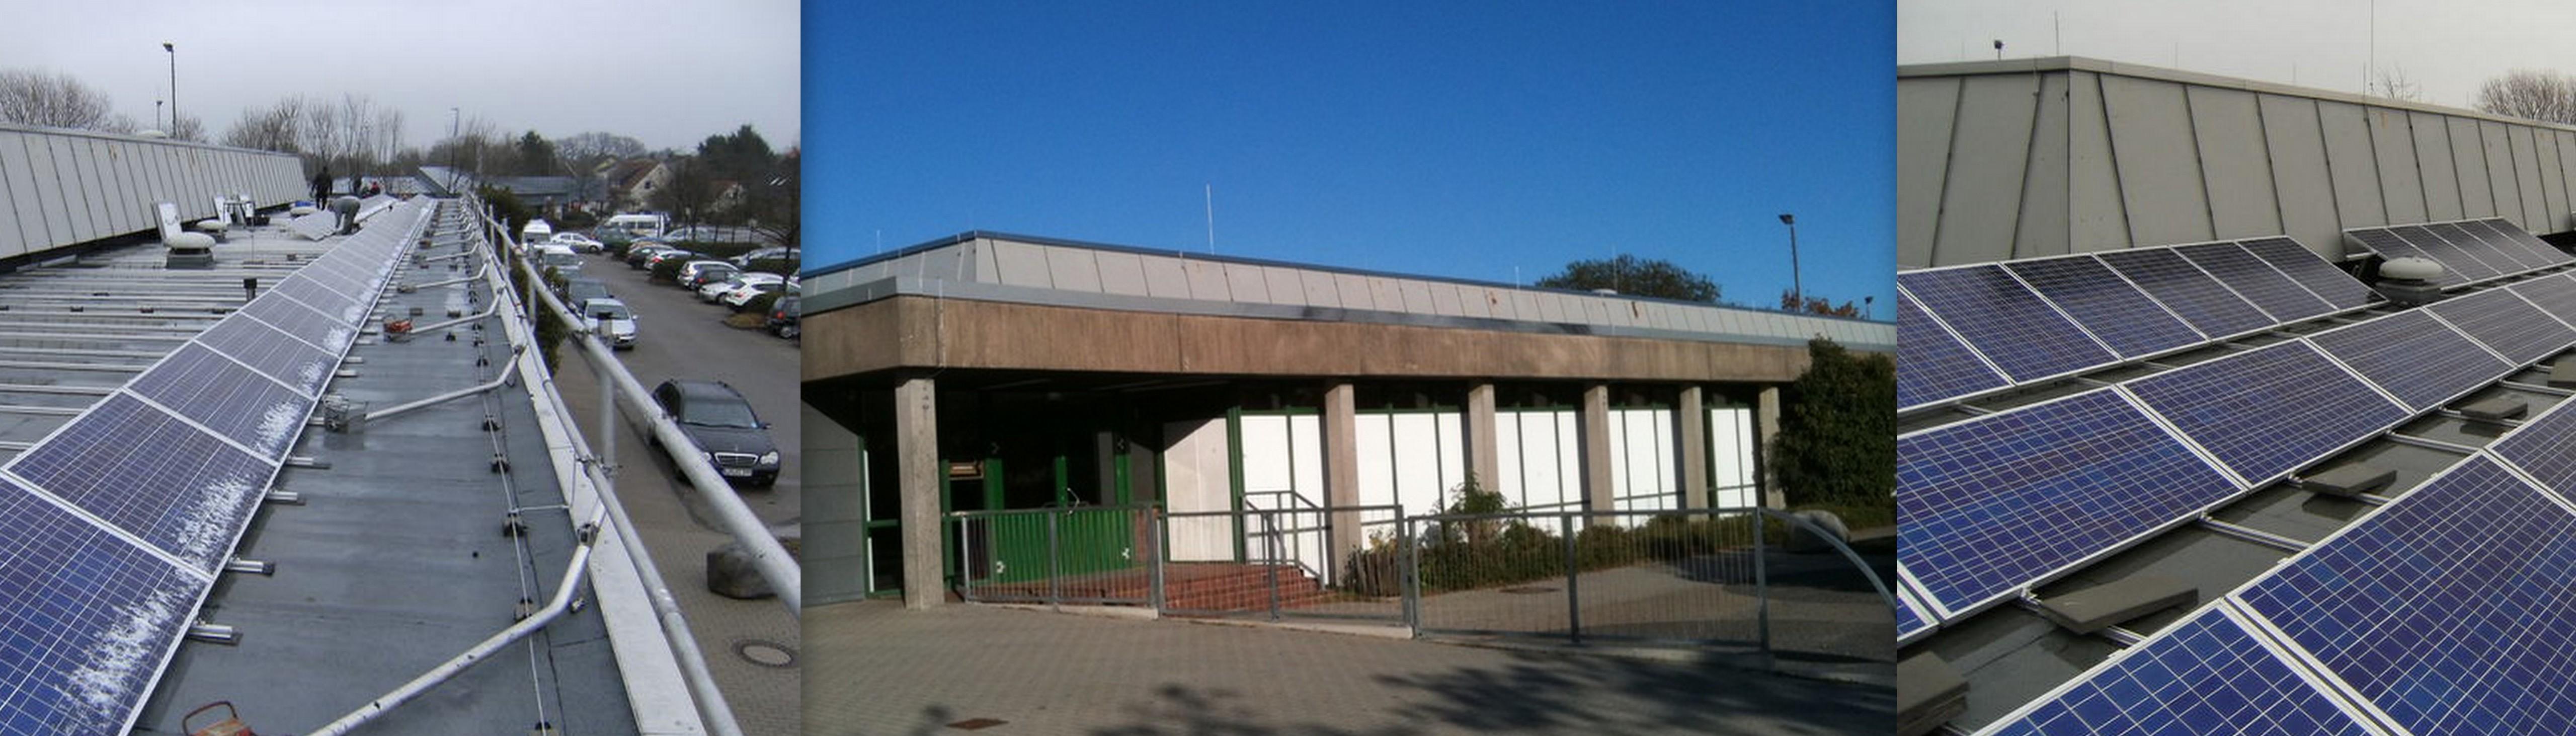 Dreifachturnhalle Felix-Fechenbach-Gesamtschule